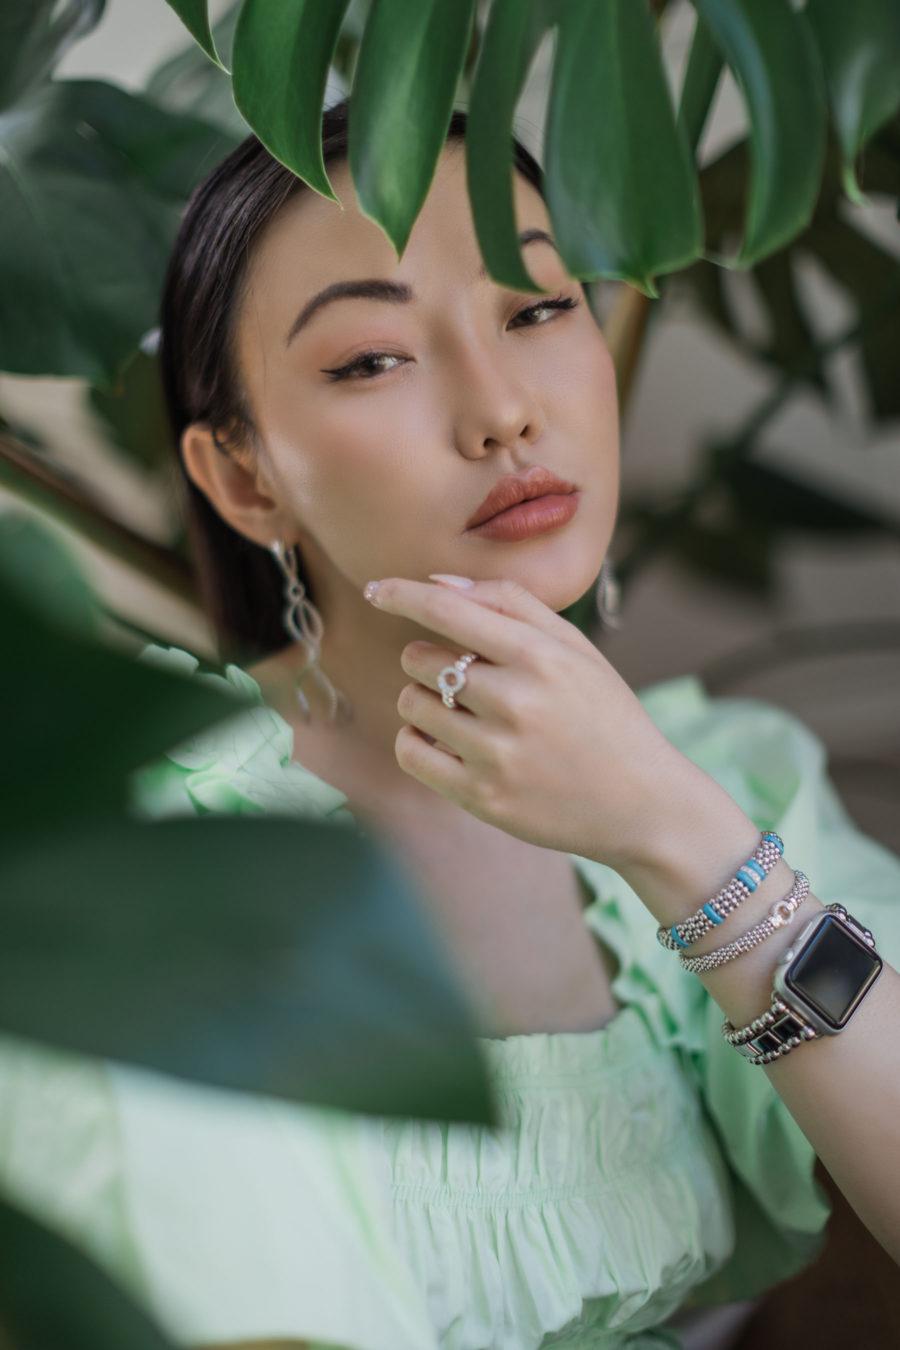 jessica wang wearing lagos jewelry brand // Jessica Wang - Notjessfashion.com